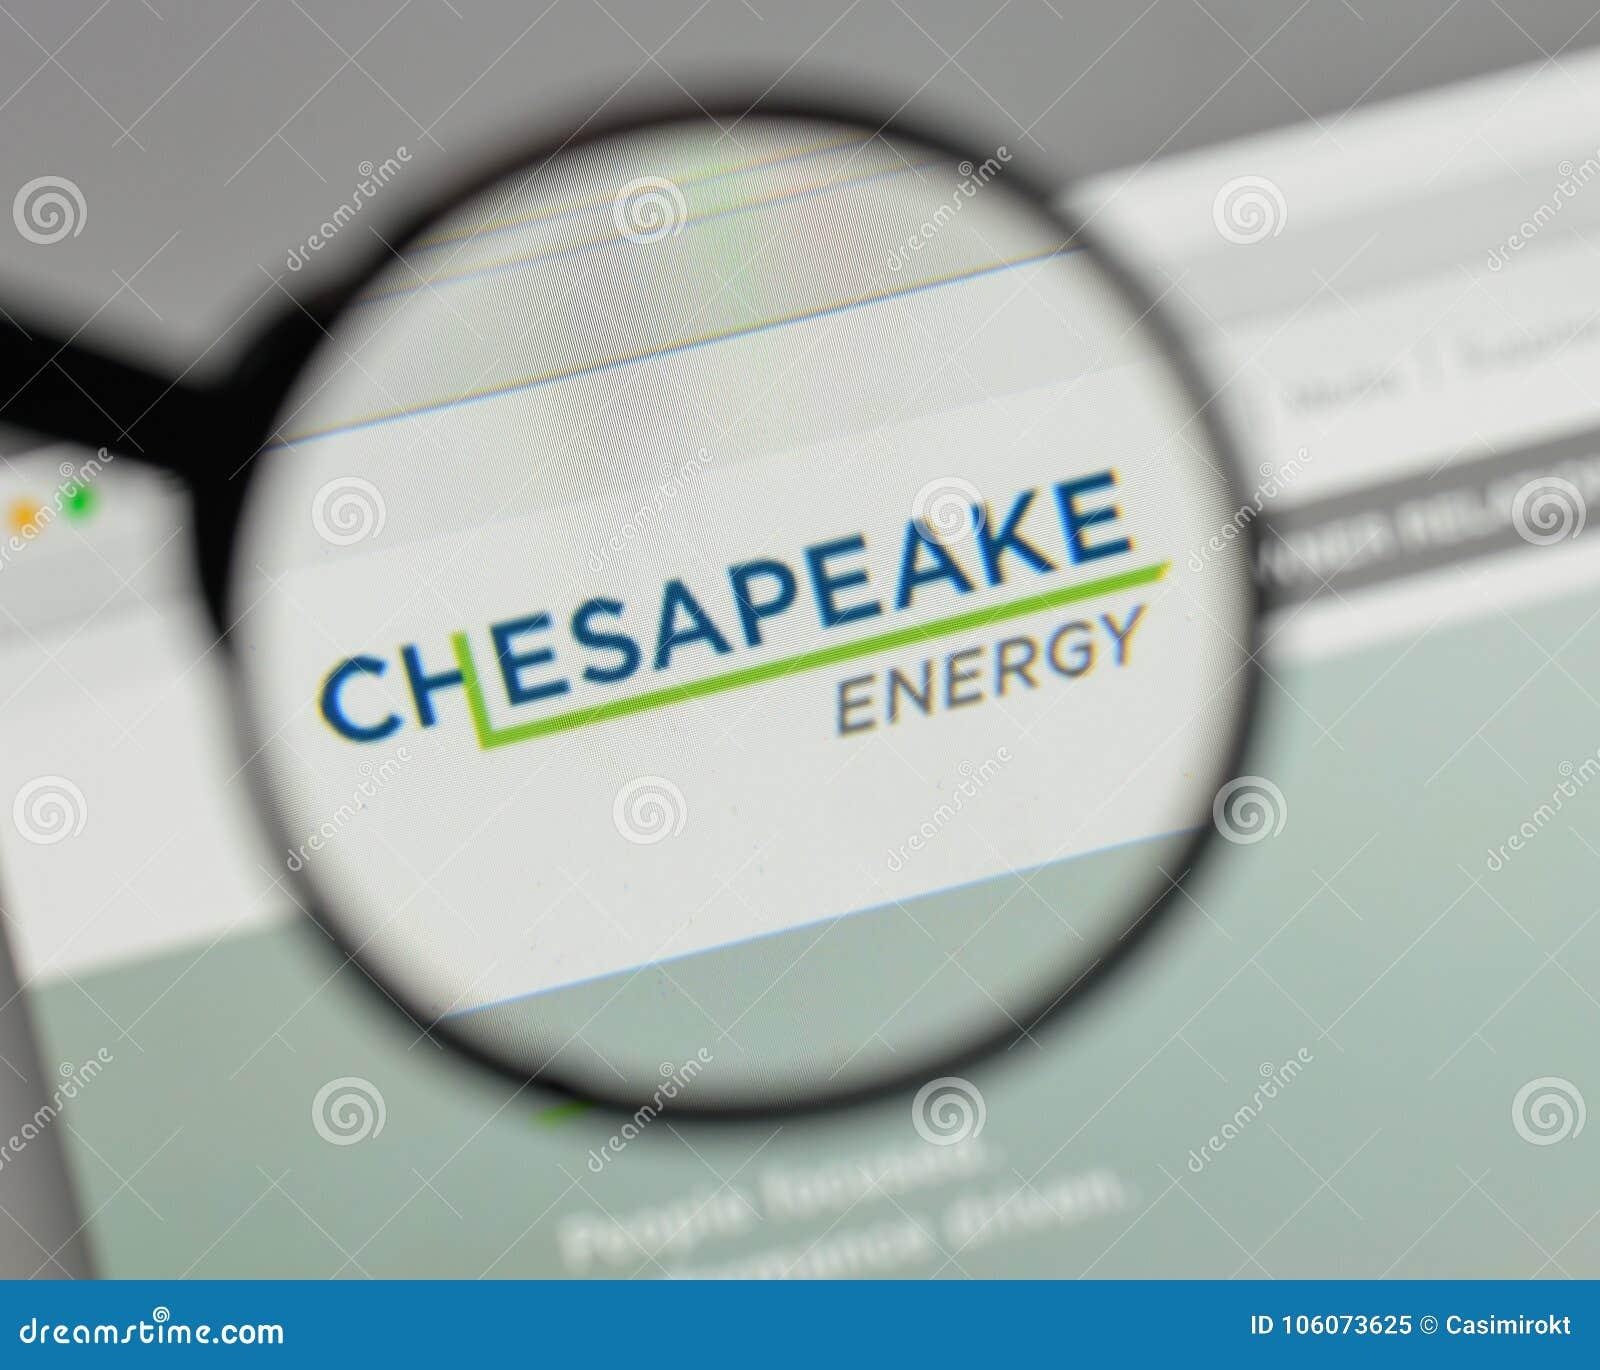 Milan Italy August 10 2017 Chesapeake Energy Logo On The We